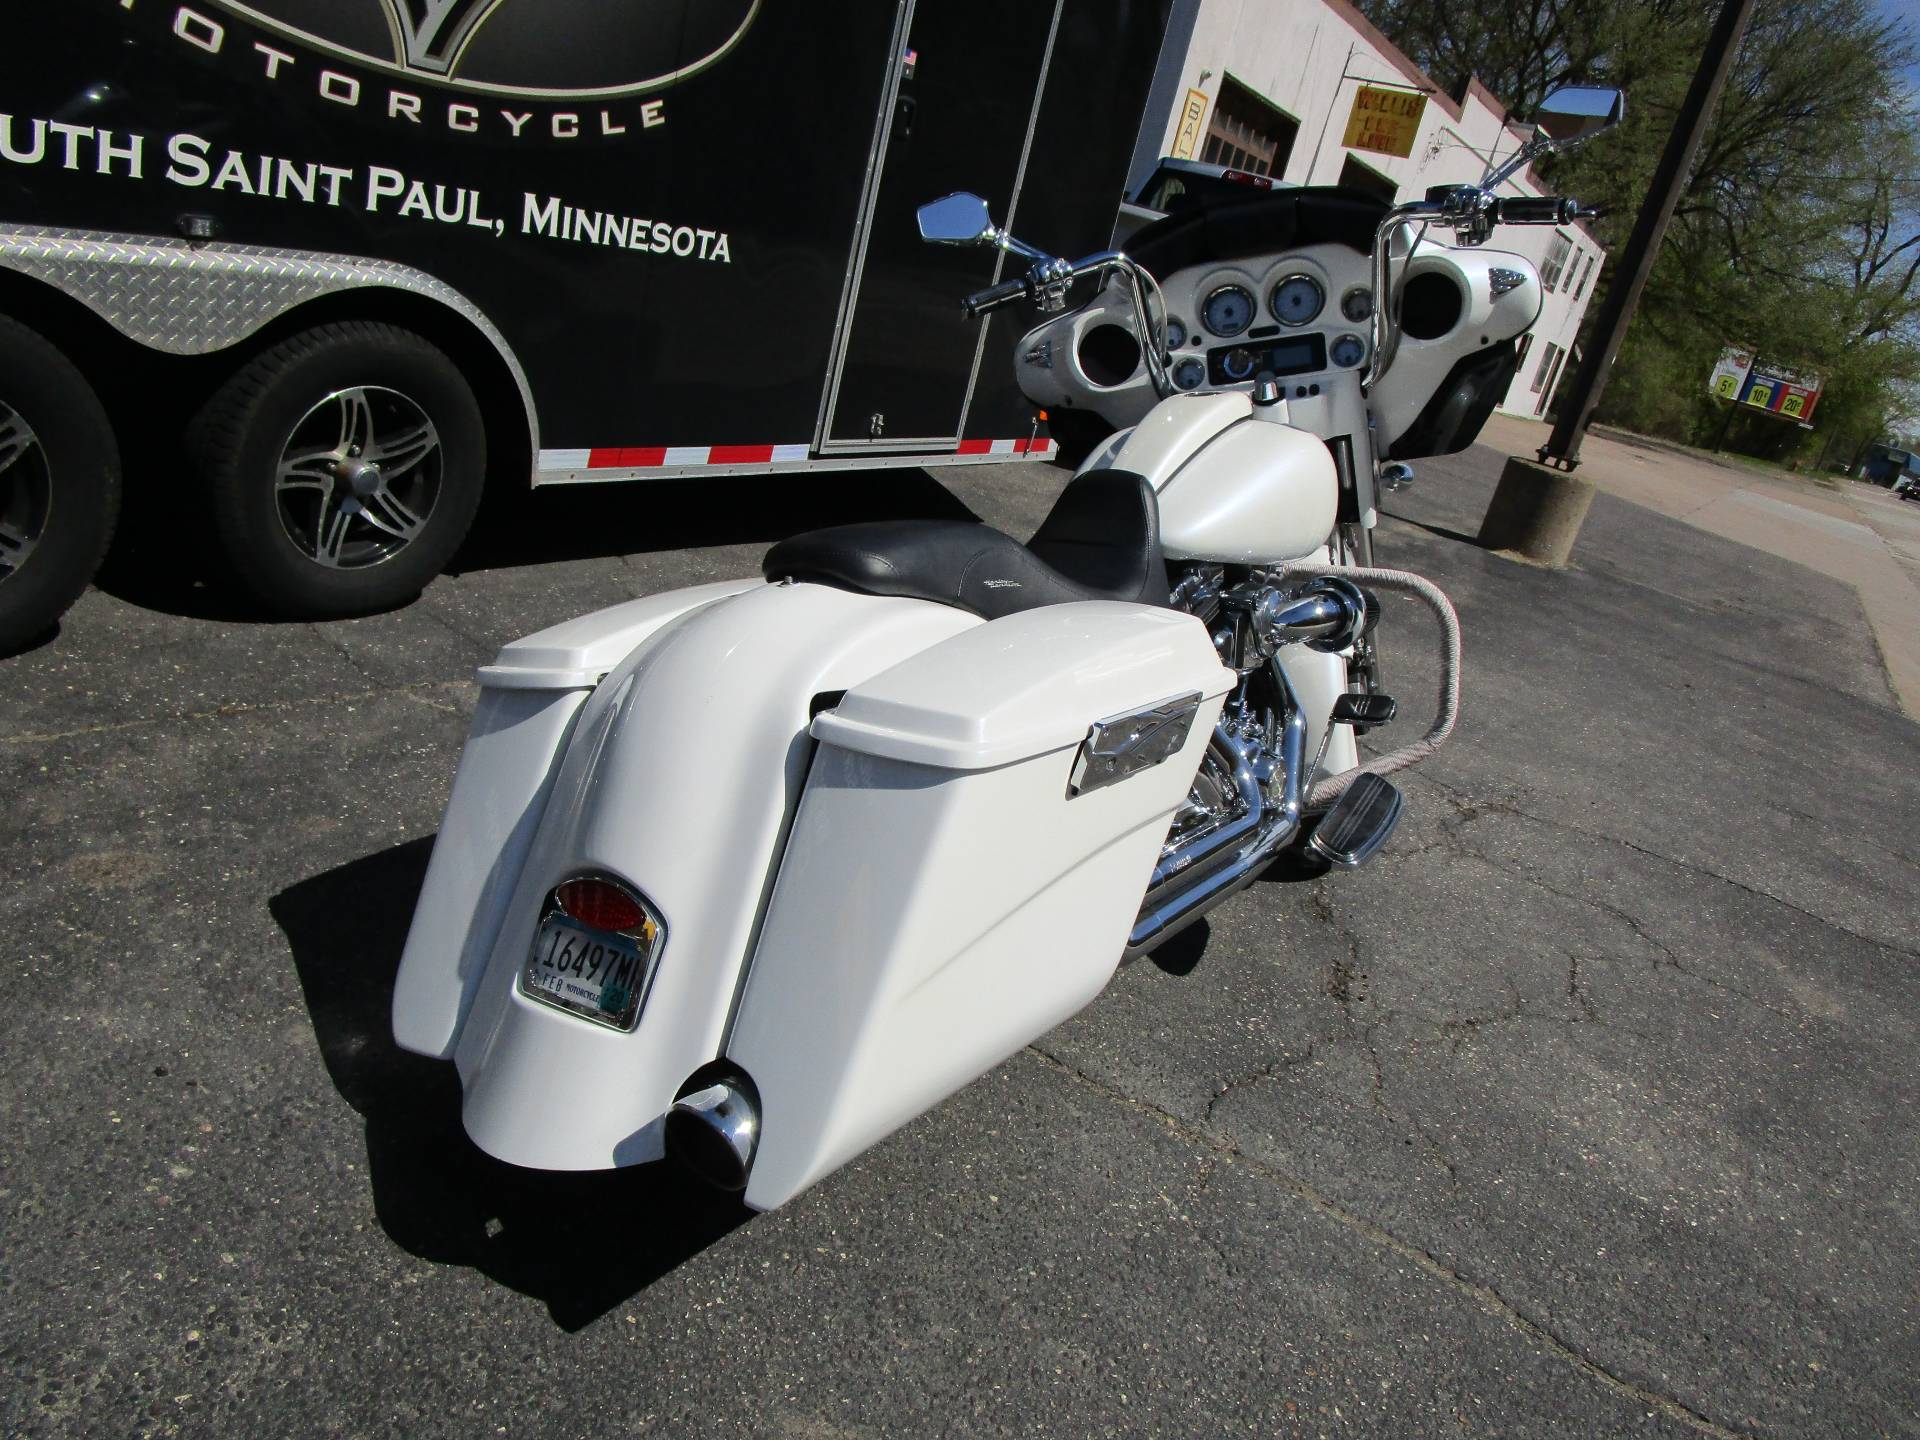 2008 Harley-Davidson FLHX STREET GLIDE 6